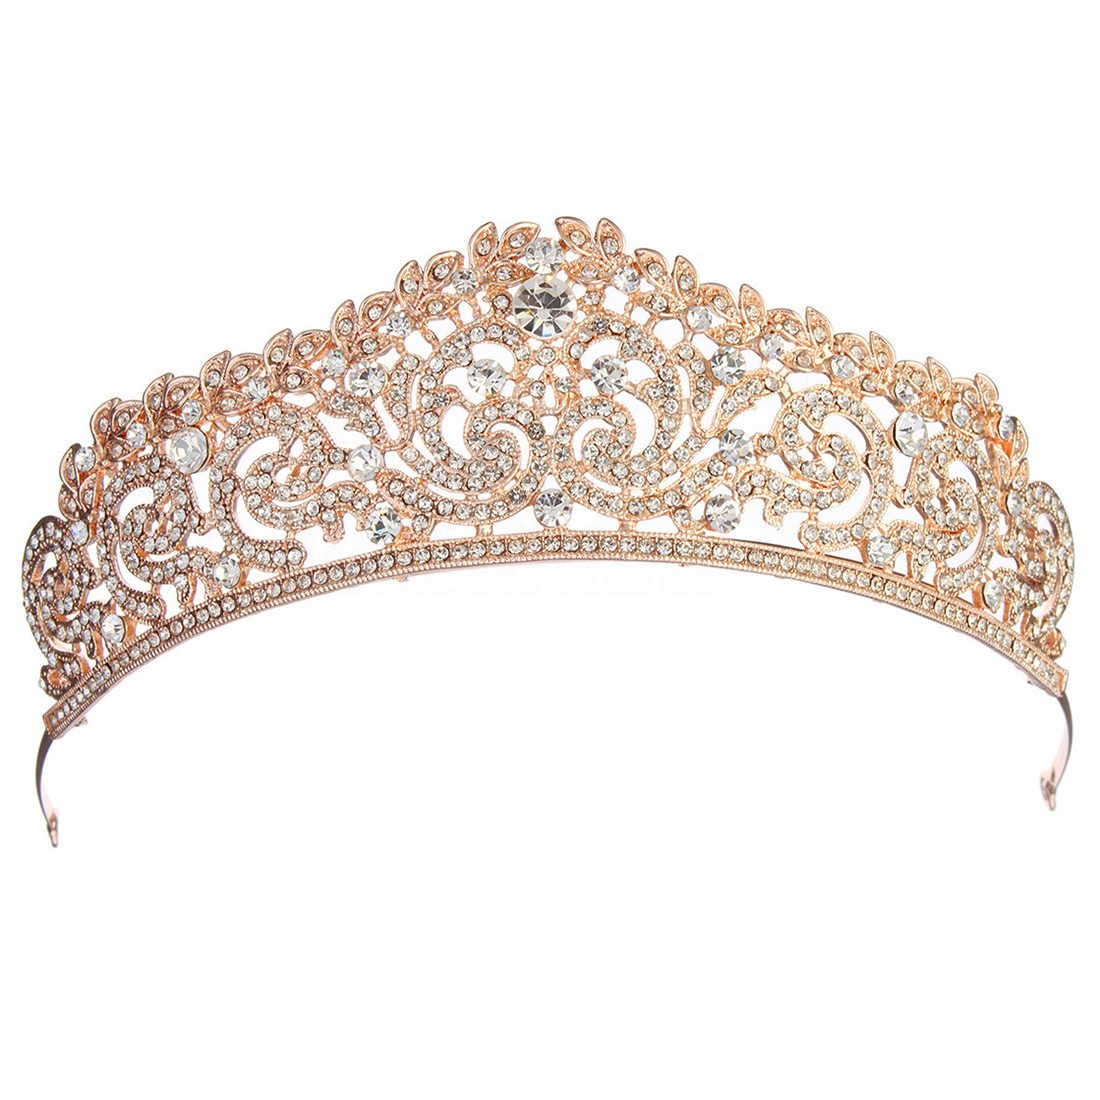 Details About Wedding Bridal Gold Crystal Rhinestone Pageant Tiara Crown Party Headb H9a3